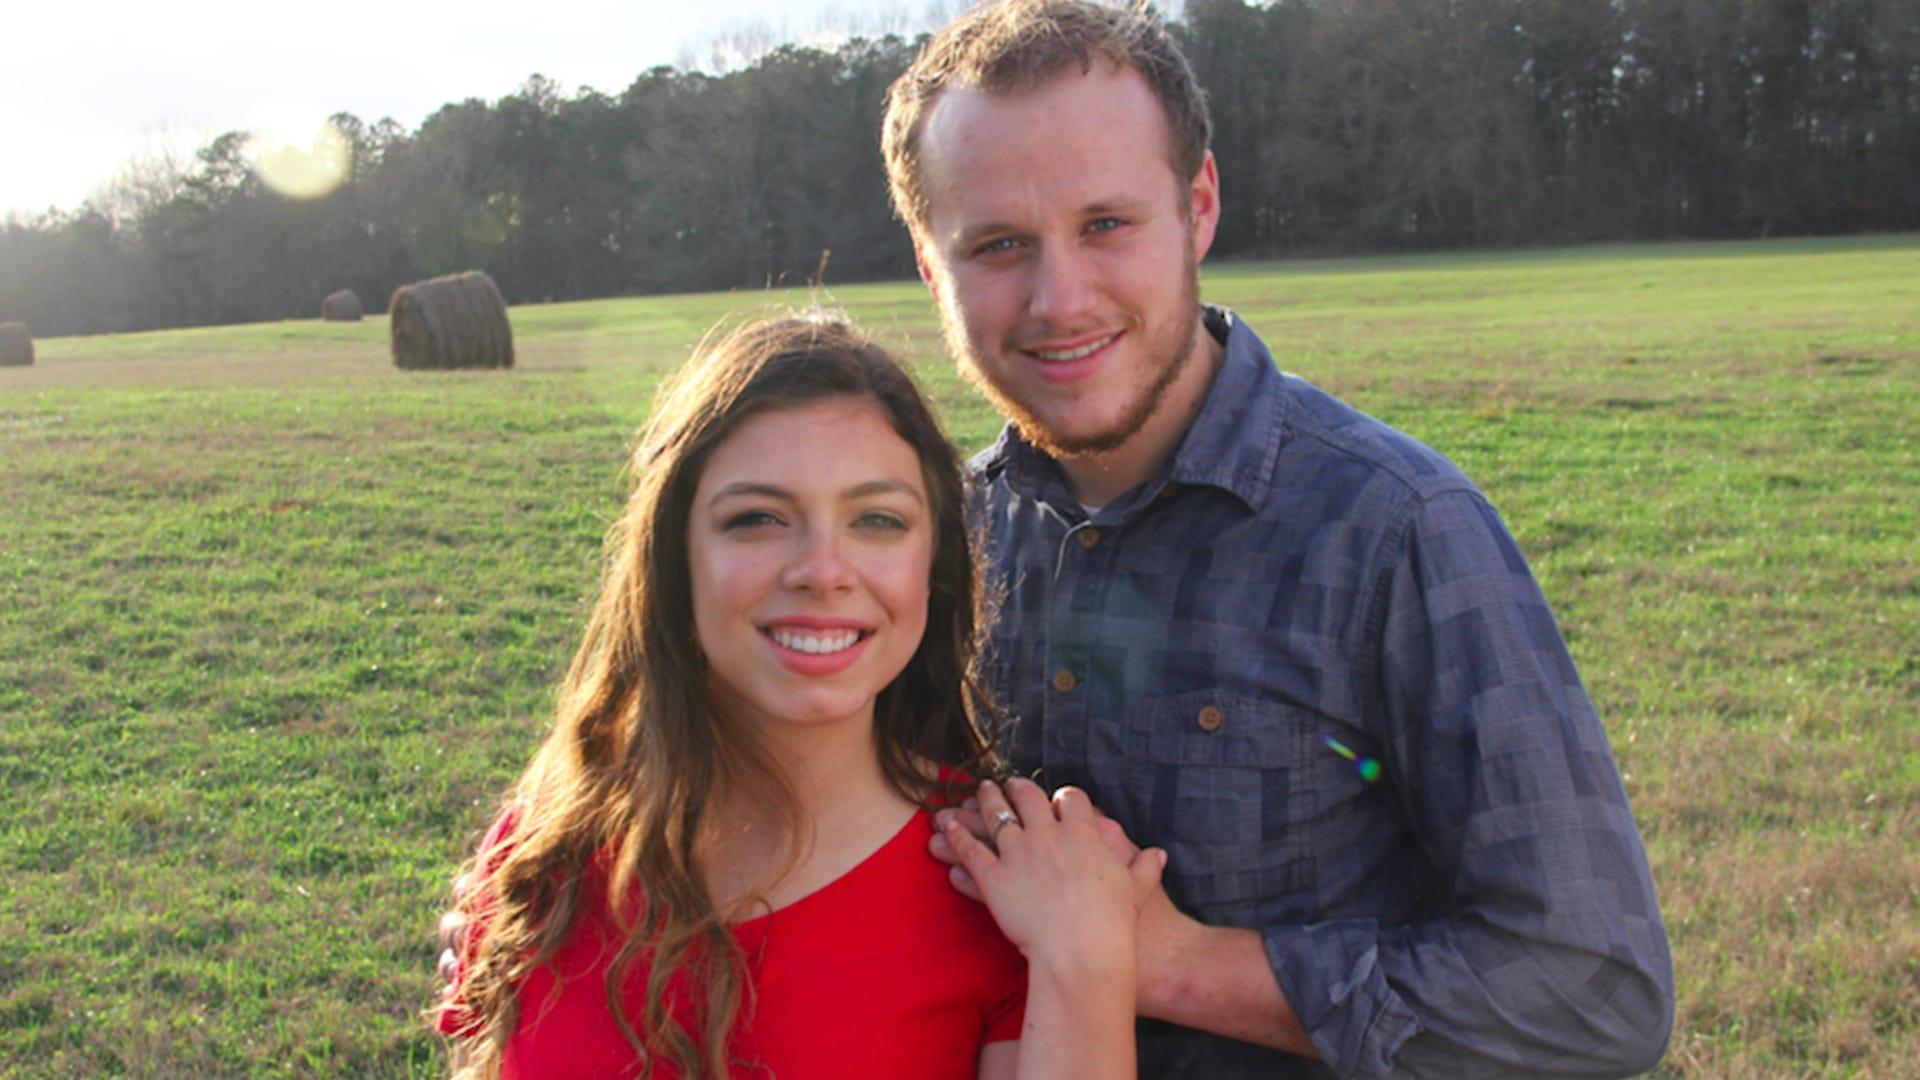 Lauren Swanson, Josiah Duggar